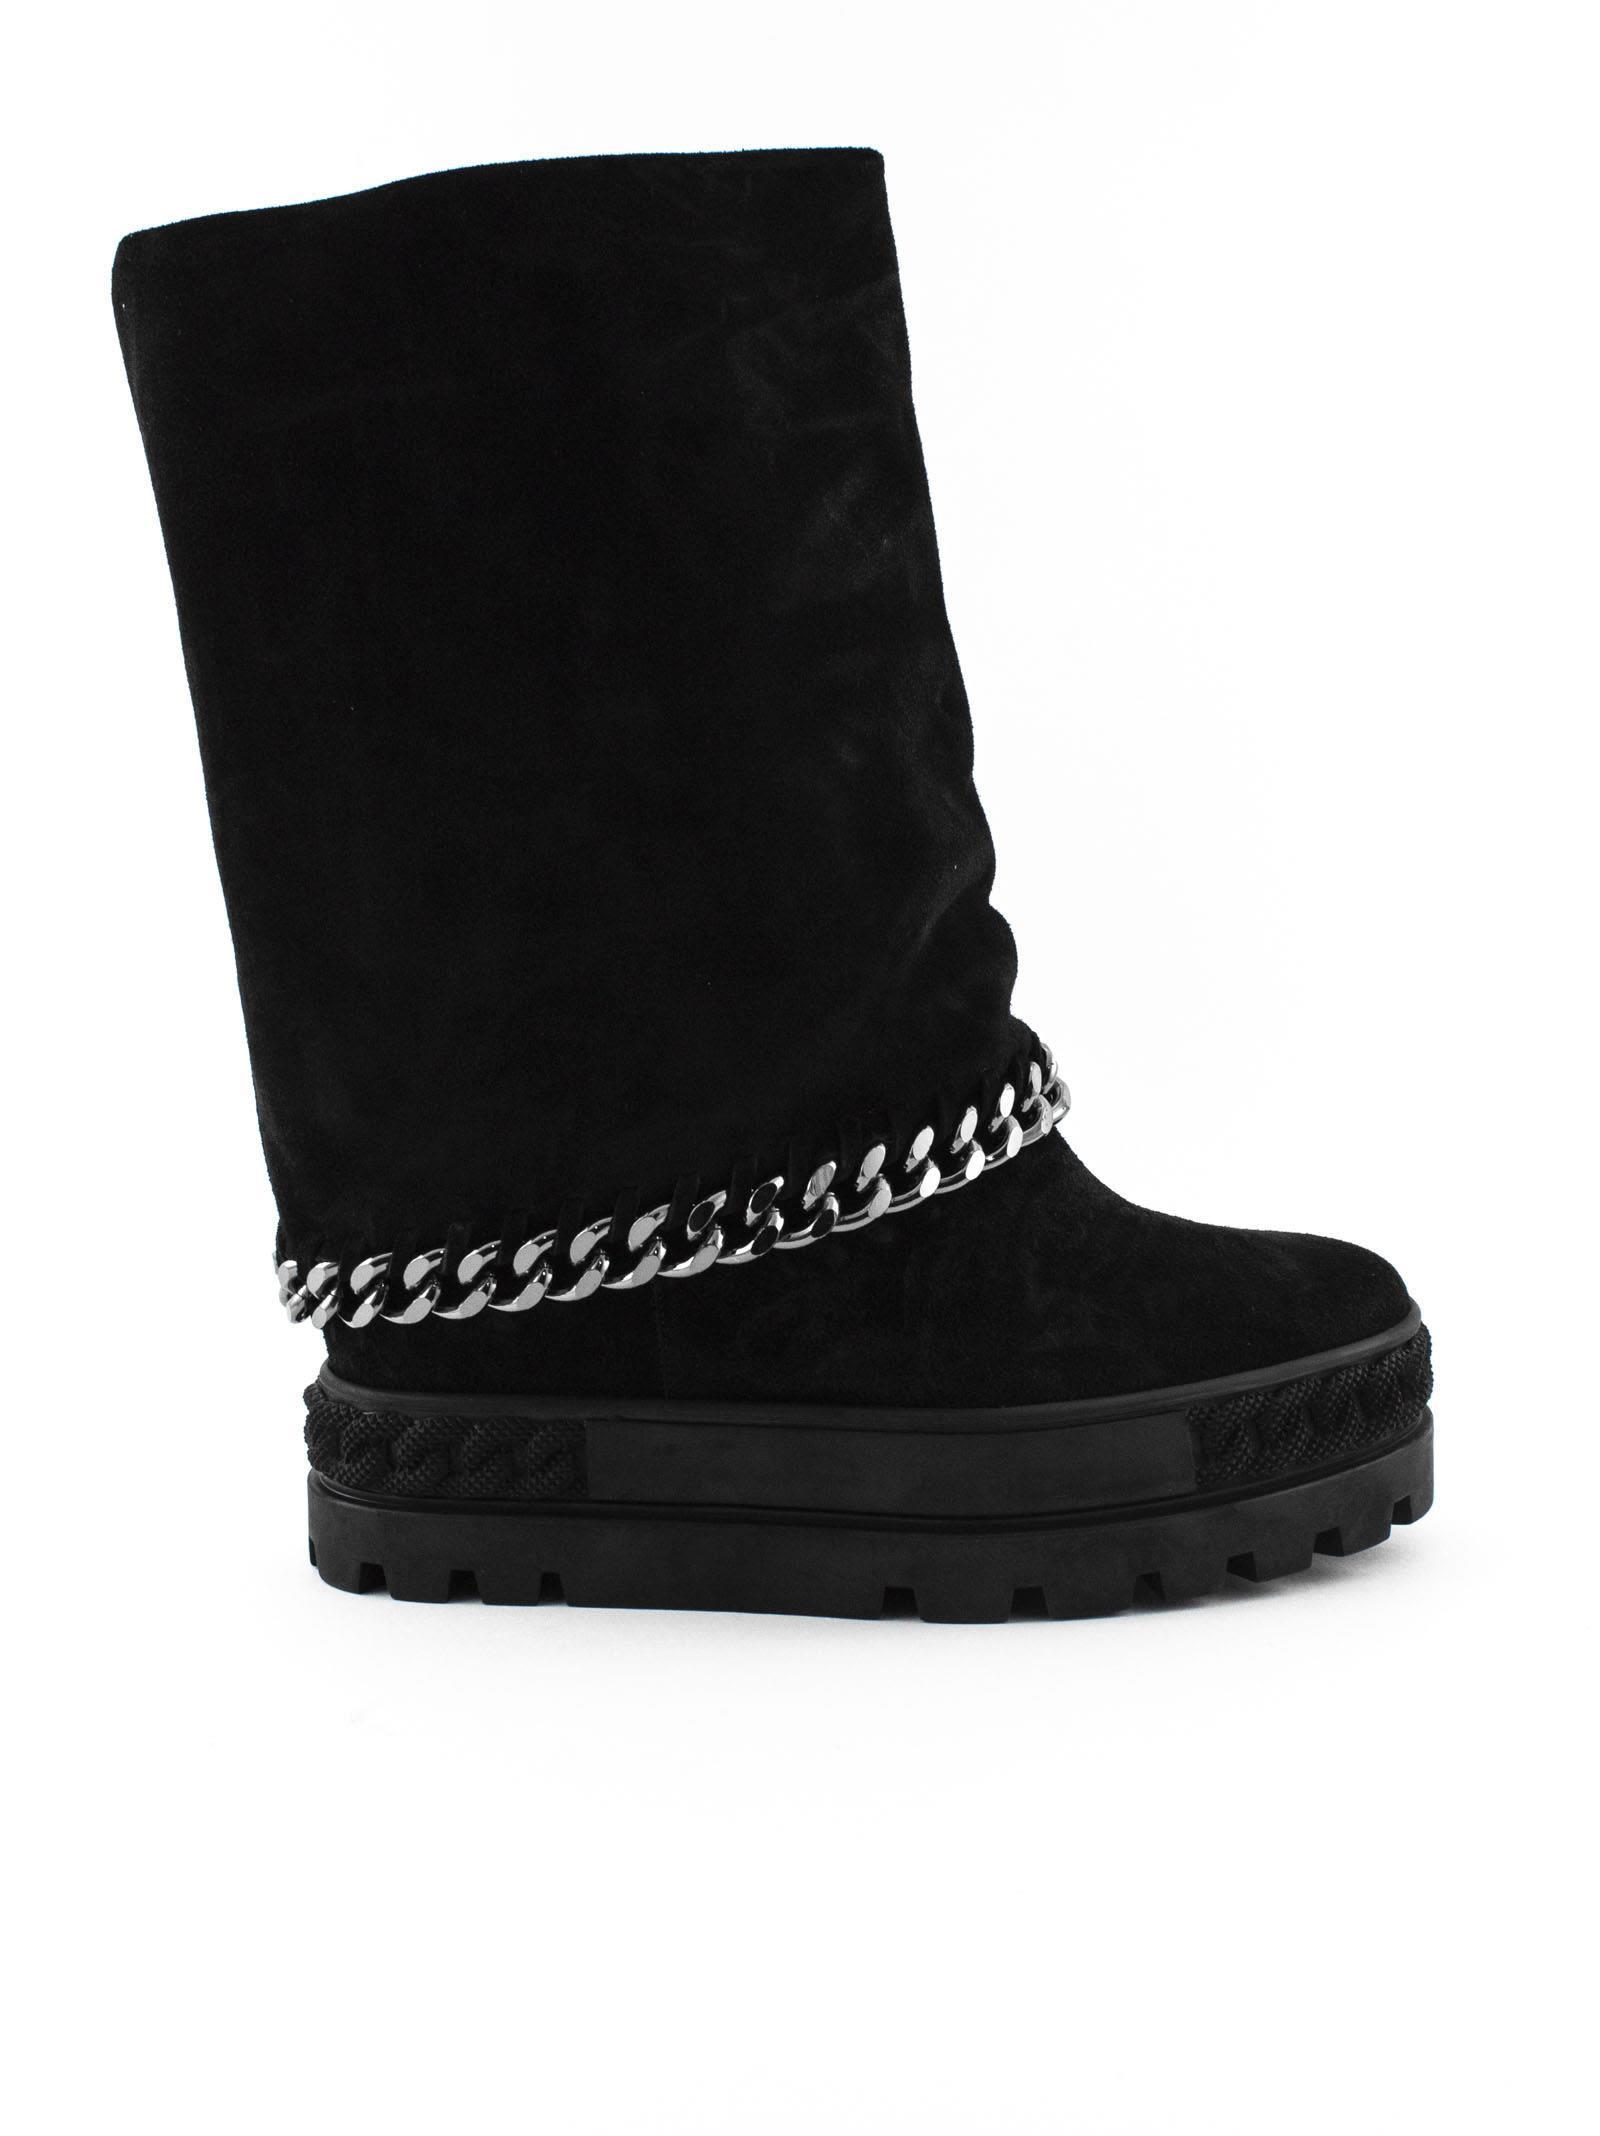 Reversable Sneaker In Black Suede., Nero